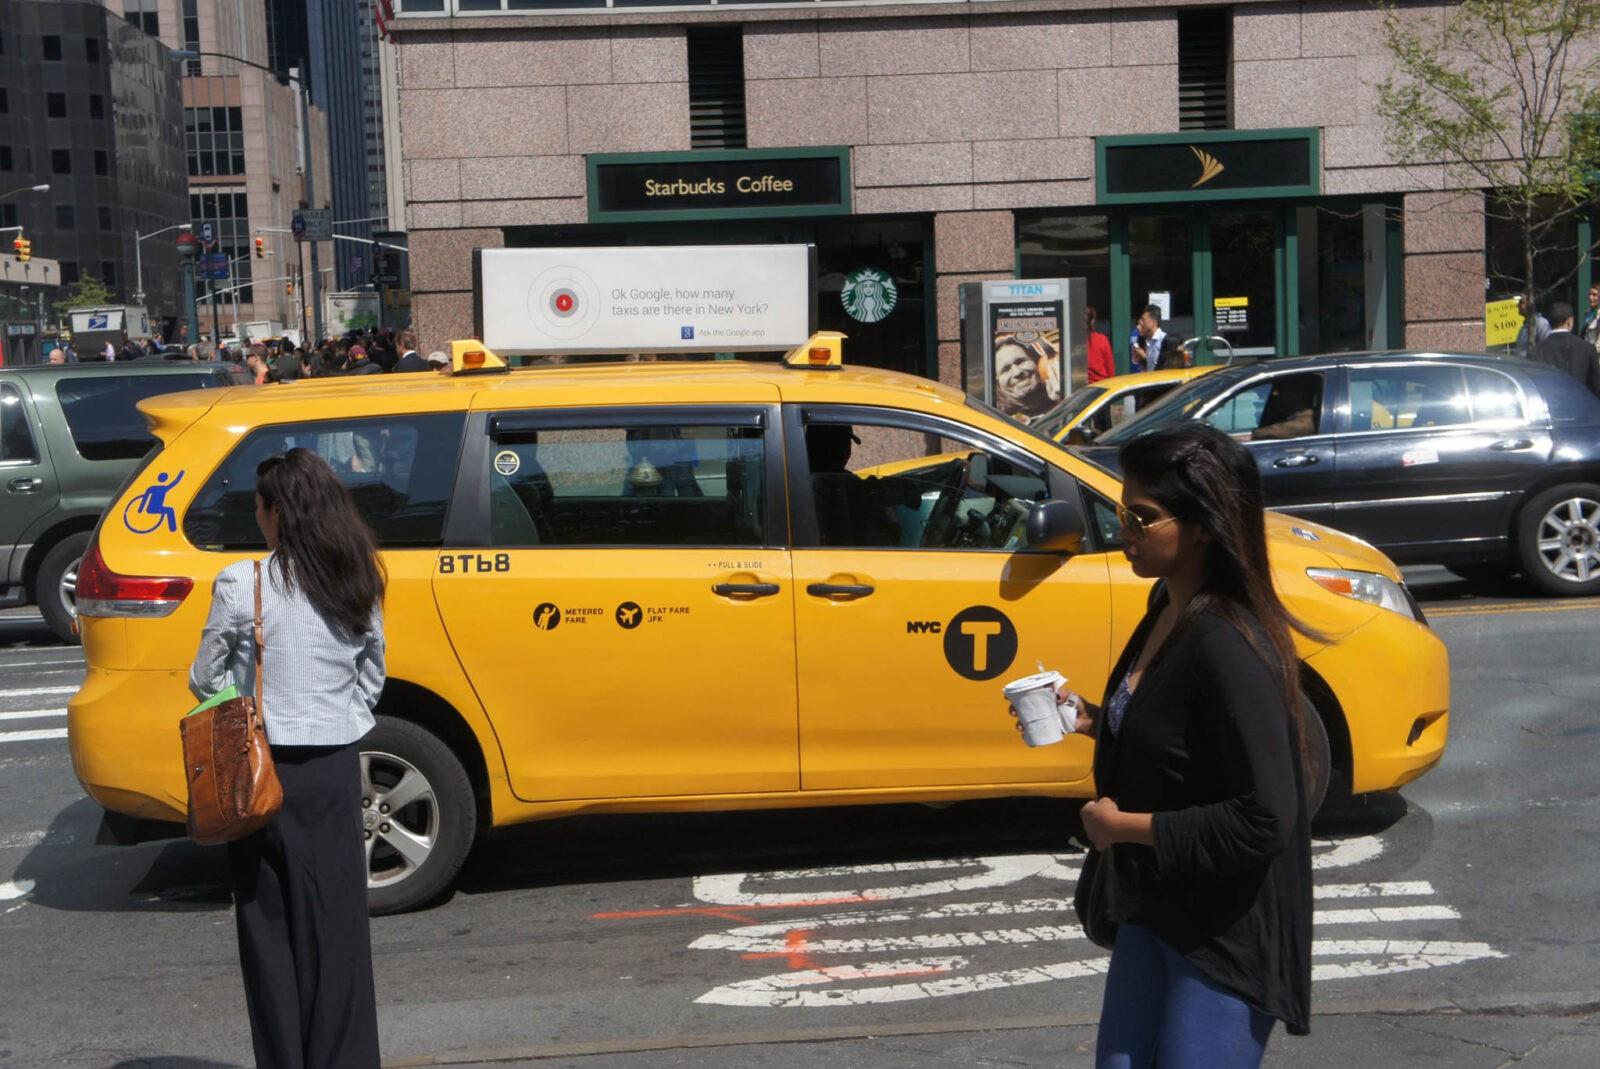 The OK Google Taxi Campaign